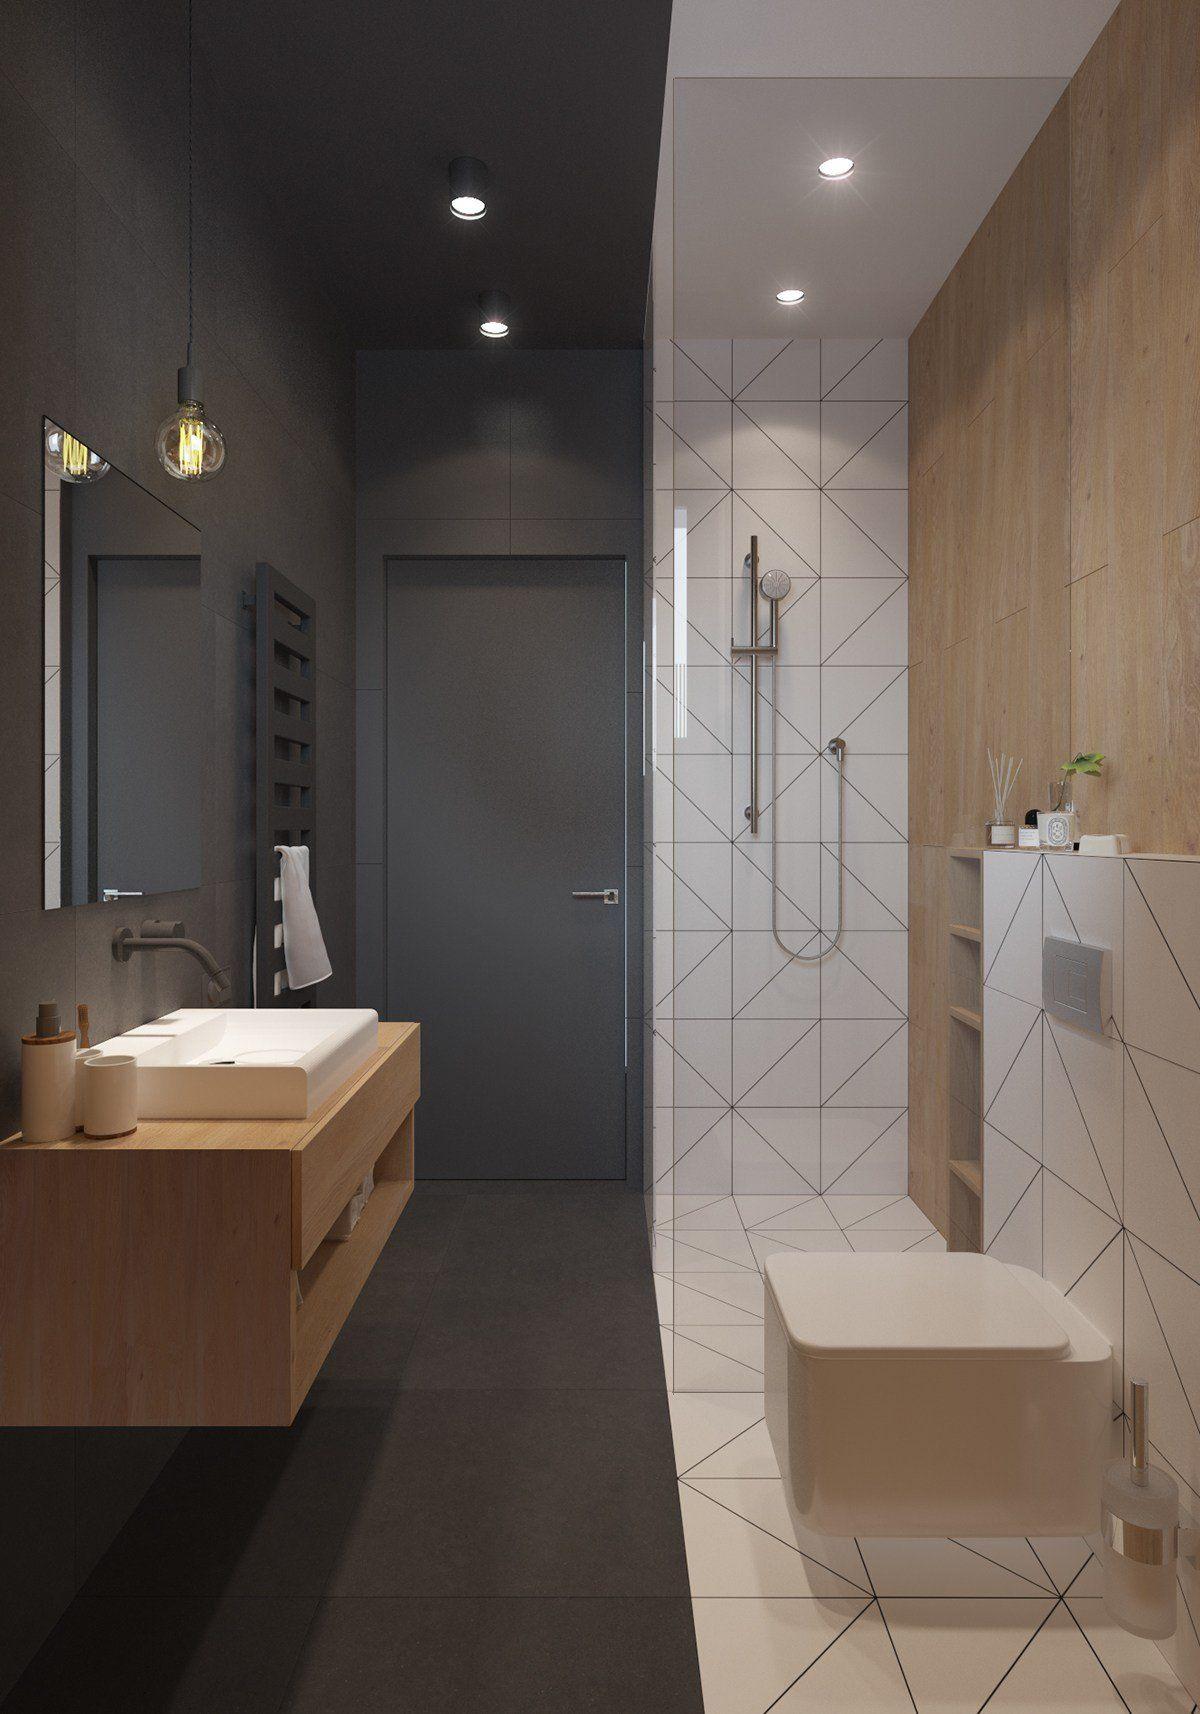 Originale Appartamento Stile Scandinavo Moderno Design Nordico Unico Ed Elegante Arredamento Bagno Bagni Moderni Bagno Scandinavo